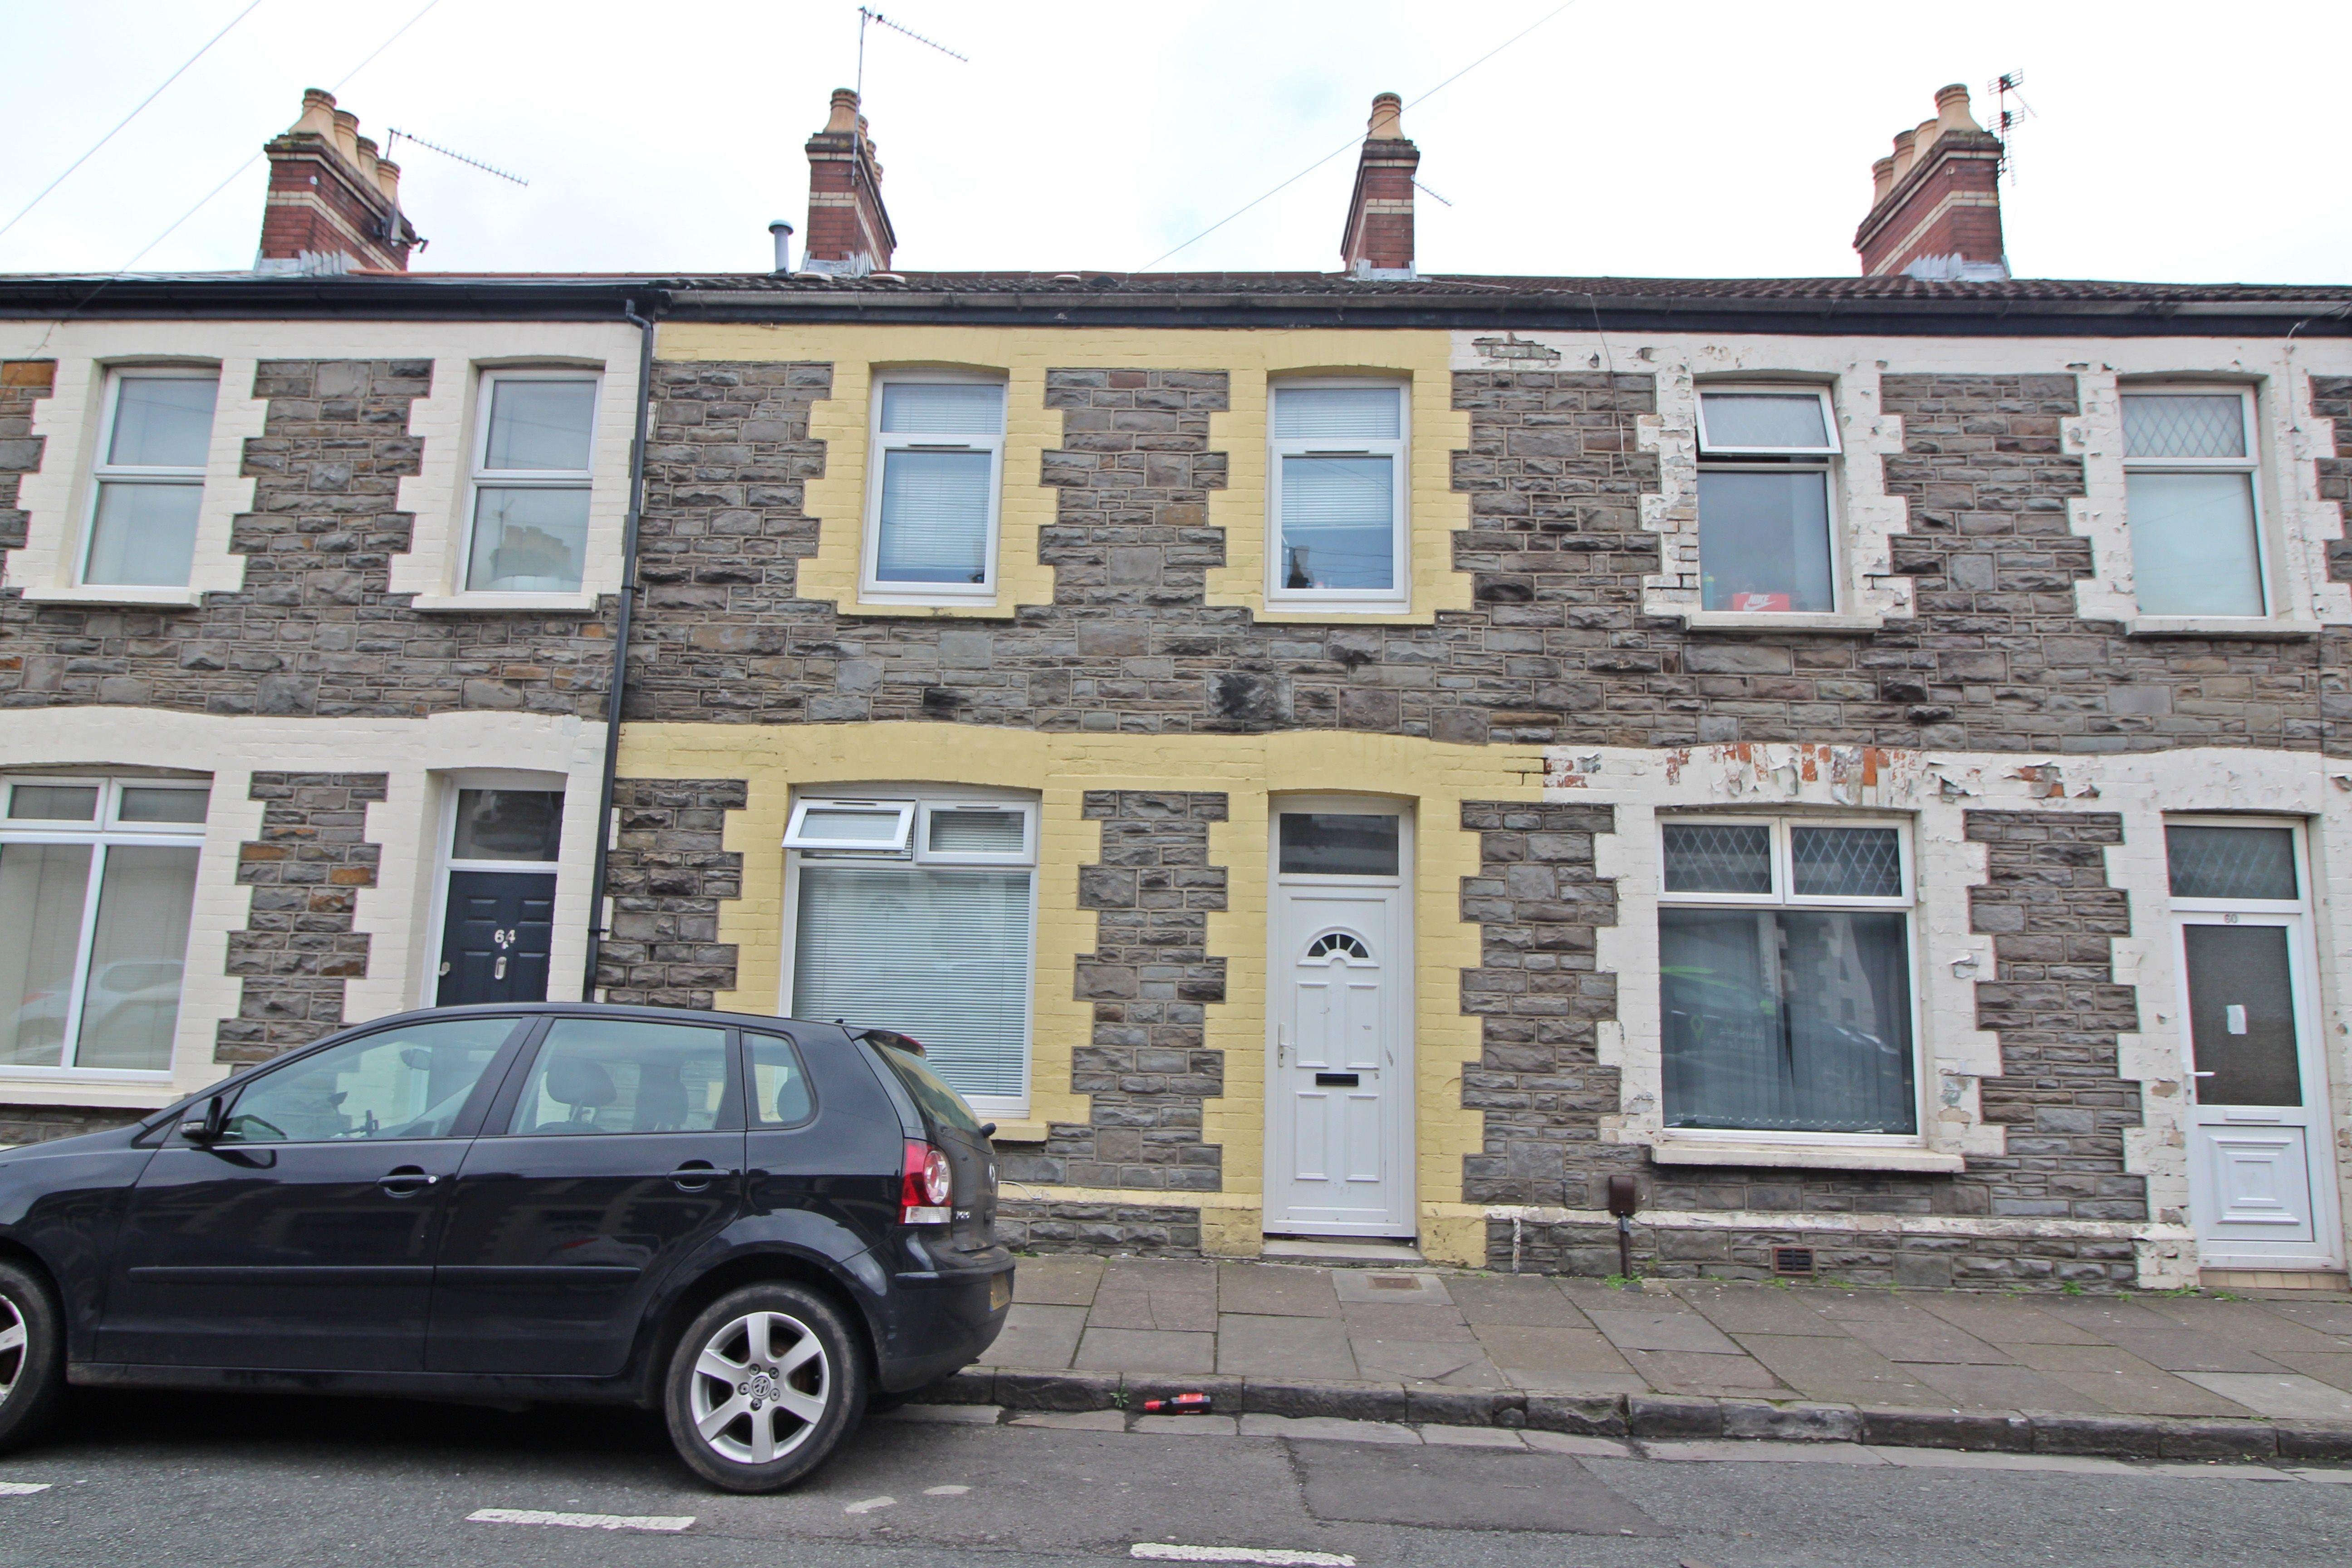 Coburn Street, Cathays, Cardiff